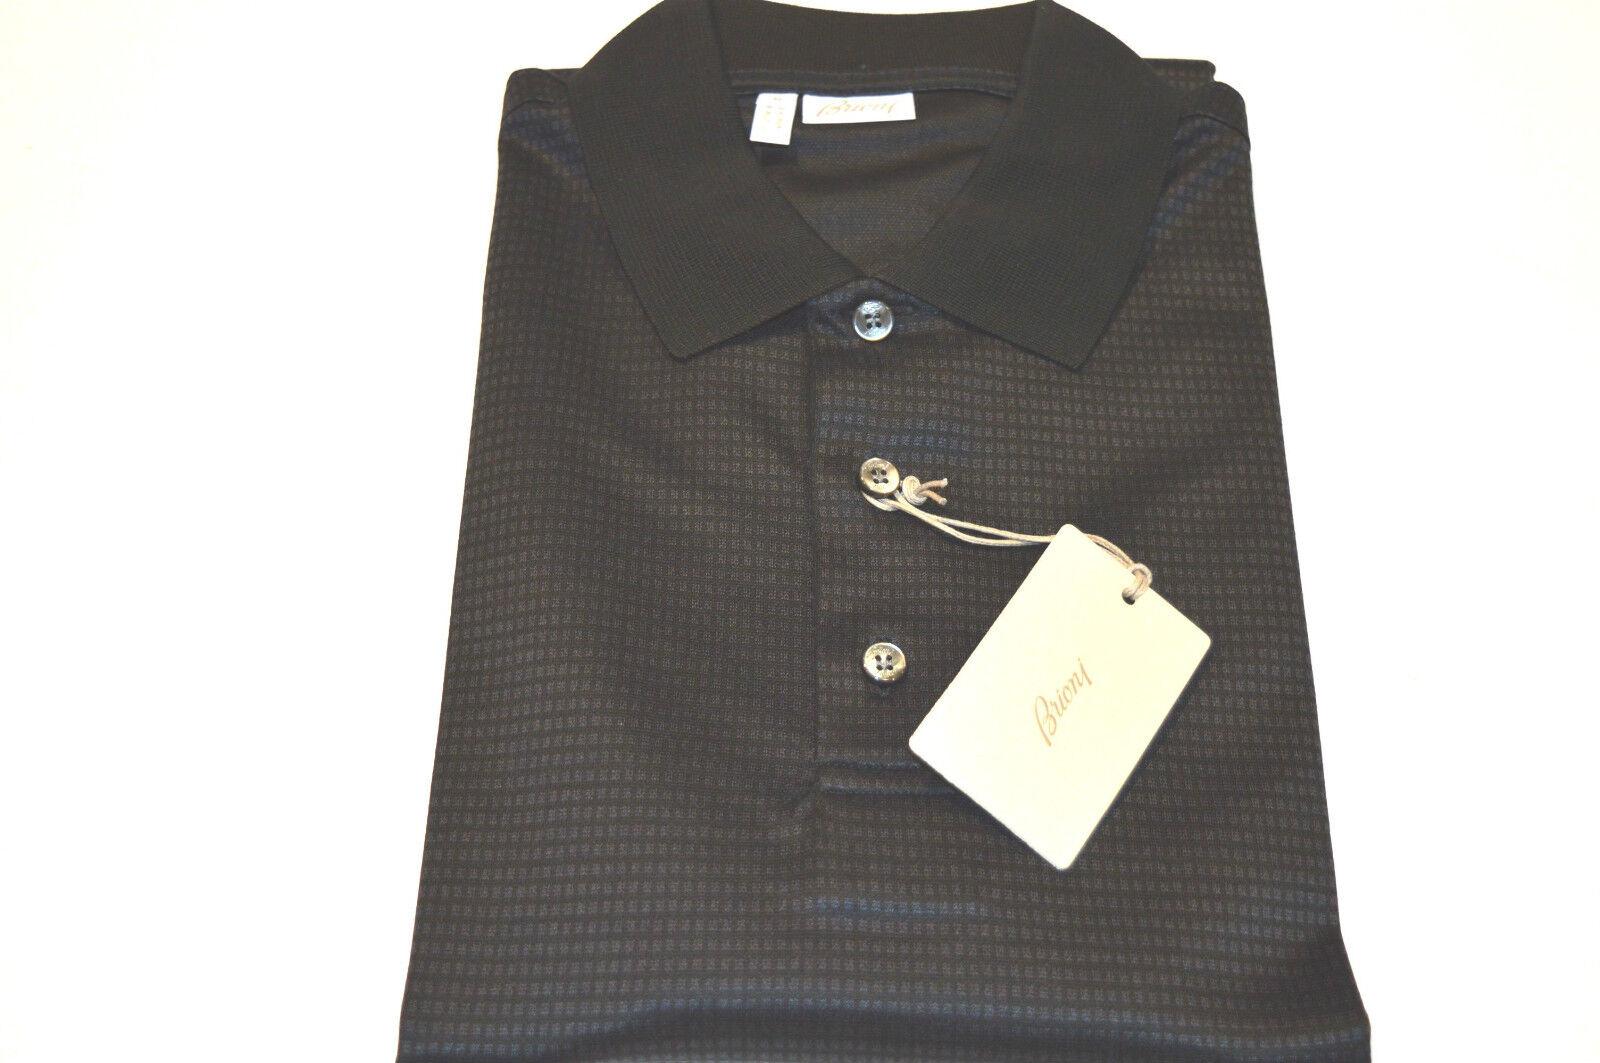 NEW  BRIONI Polo  Short Sleeve  57% Cotton  43%Silk Größe M Us Eu 50 (SpquadrB)